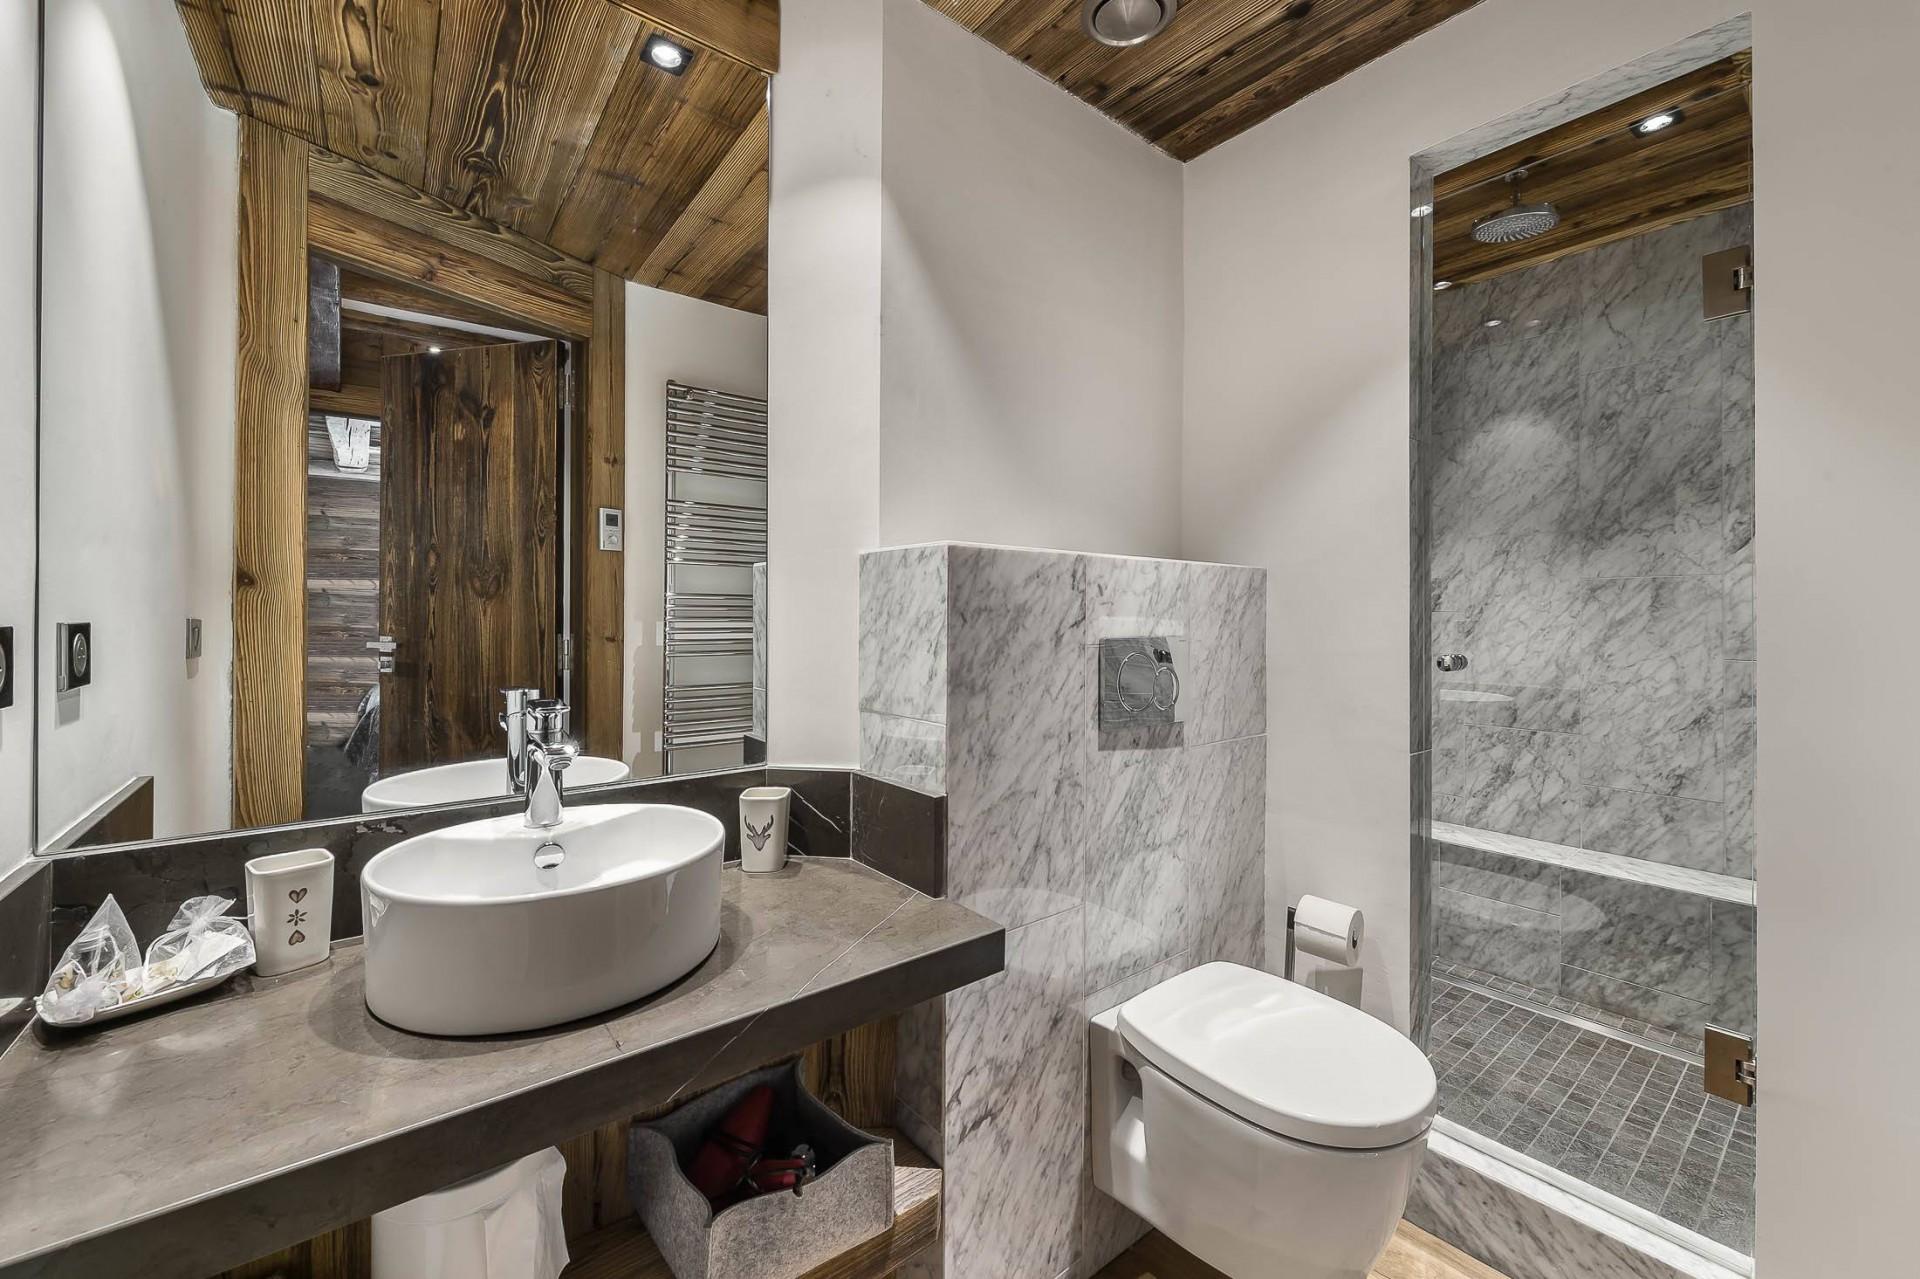 Val d'Isère Location Appartement Luxe Ucelite Salle De Bain 2